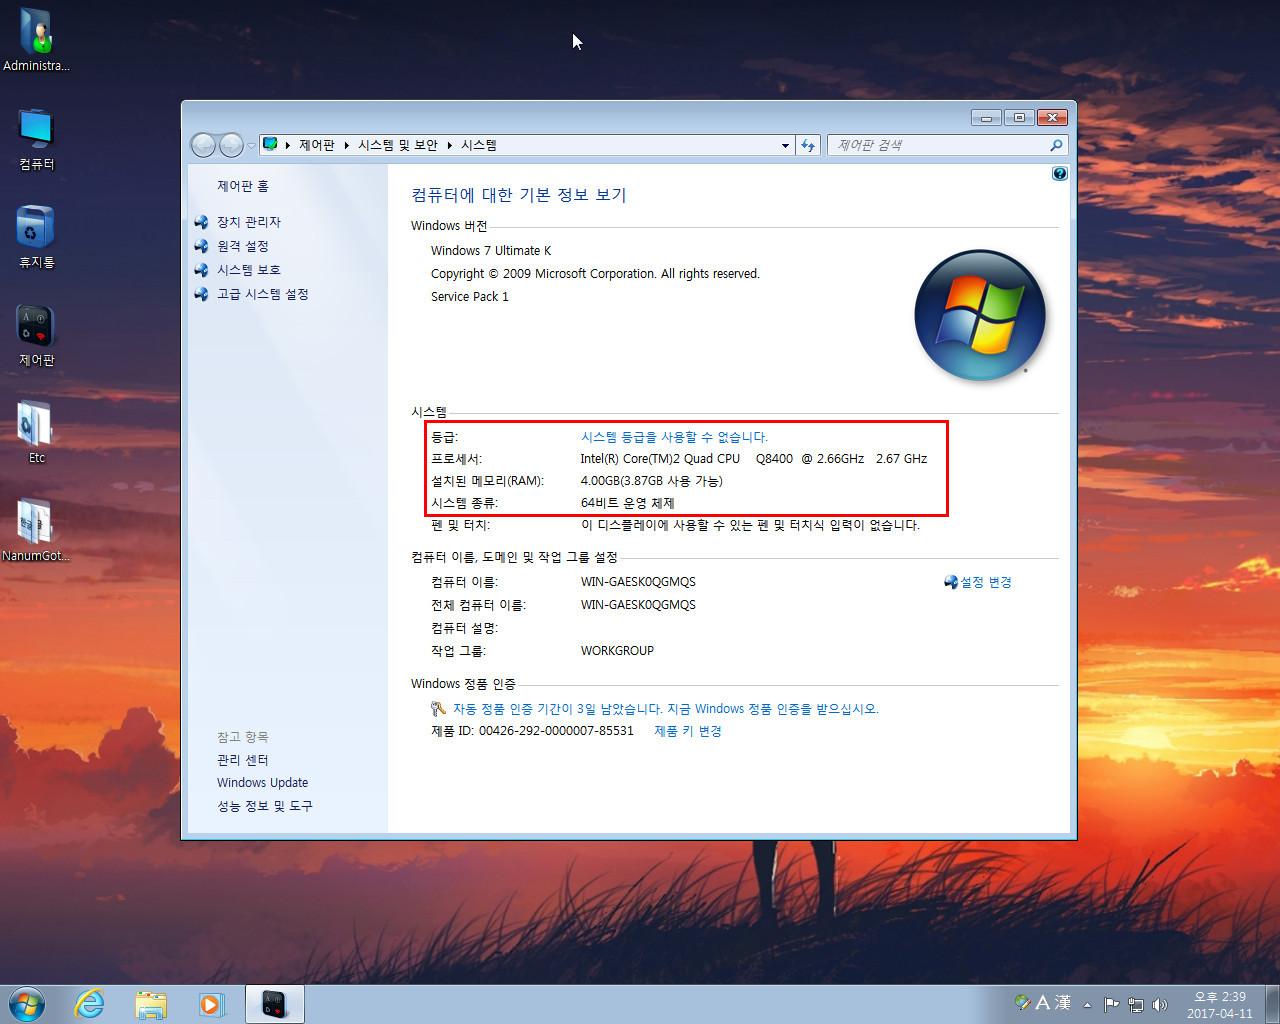 Windows 7 Ultimate_x64_Lite_KO_KY_OldMaC10.jpg